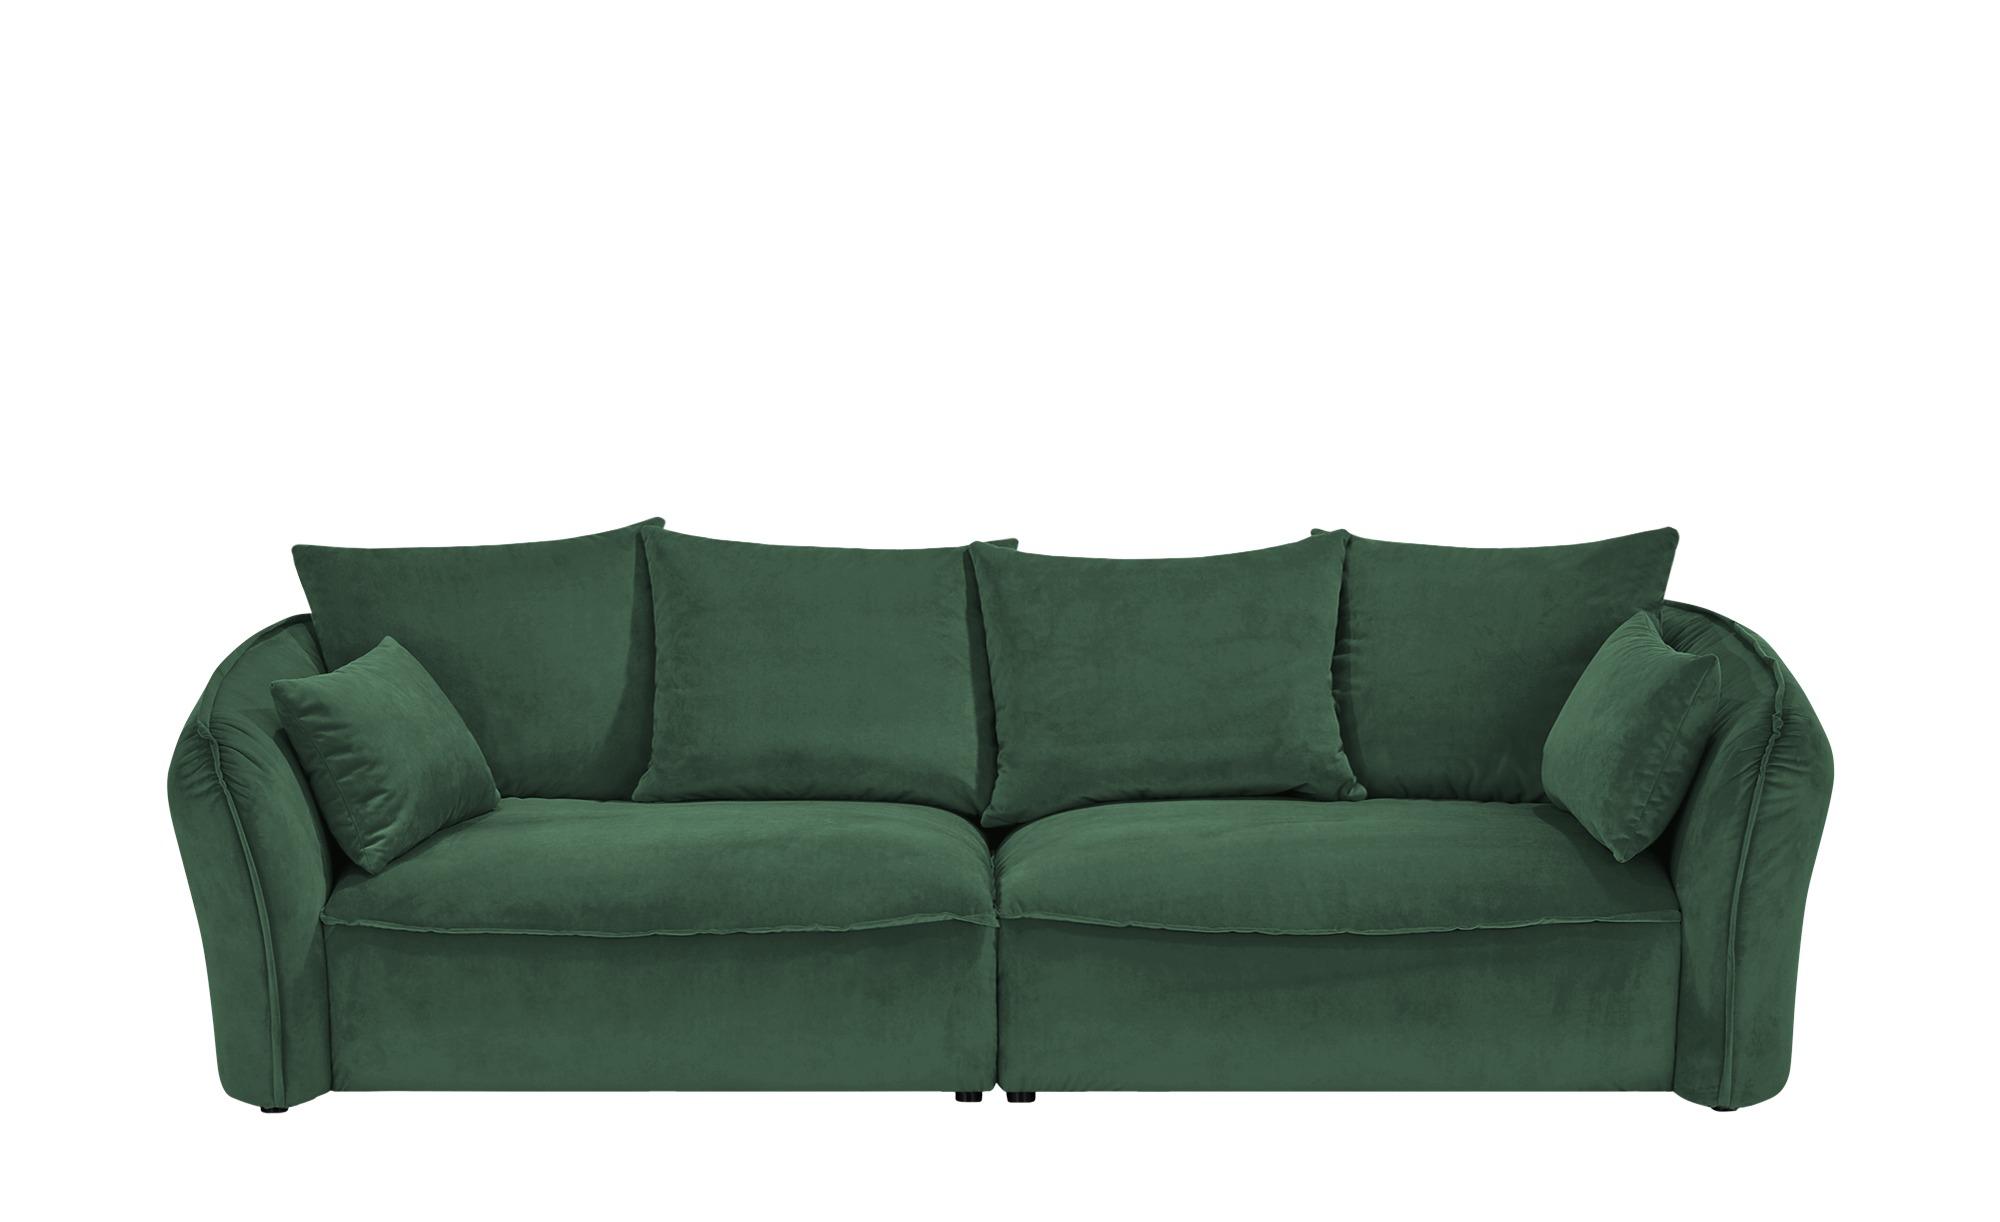 Megasofa  Yale ¦ grün ¦ Maße (cm): B: 280 H: 75 T: 118 Polstermöbel > Sofas > Einzelsofas - Höffner